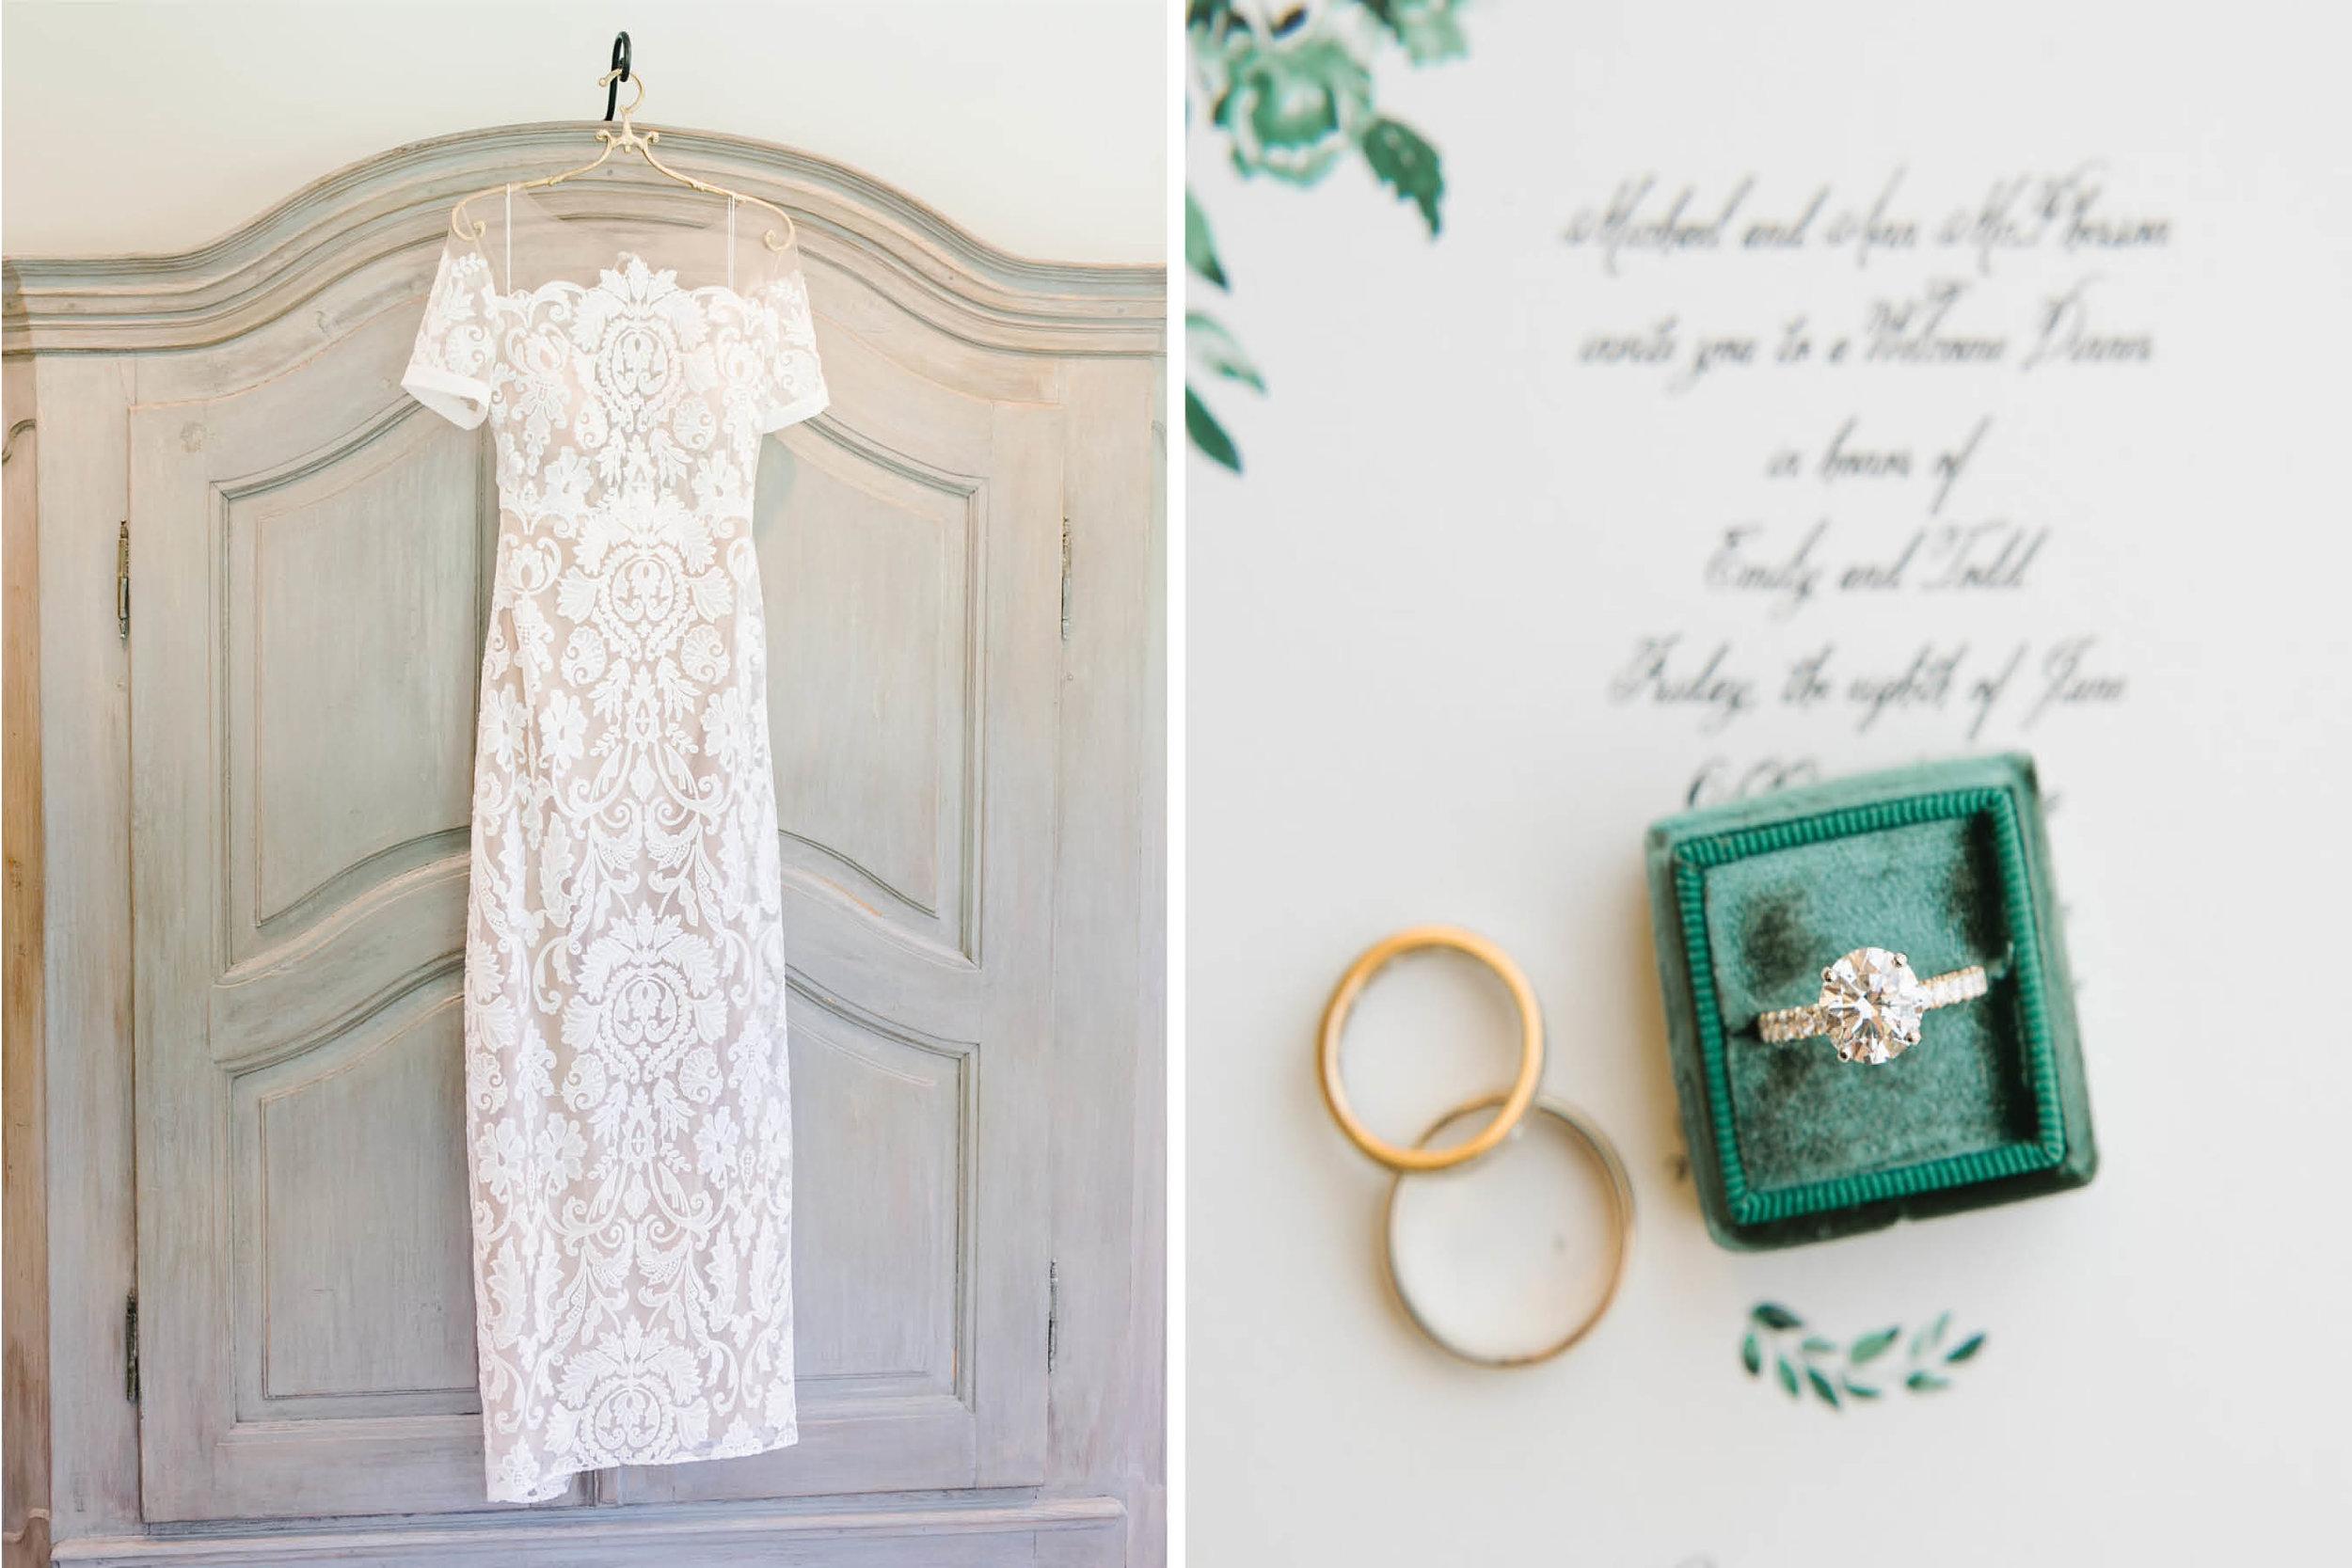 alegria-by-design-wedding-planner-planning-event-design-santa-barbara-day-of-coordinator-kestrel-park-santa-ynez-fields-castle-lavender-garden-mrs-box (3).jpg